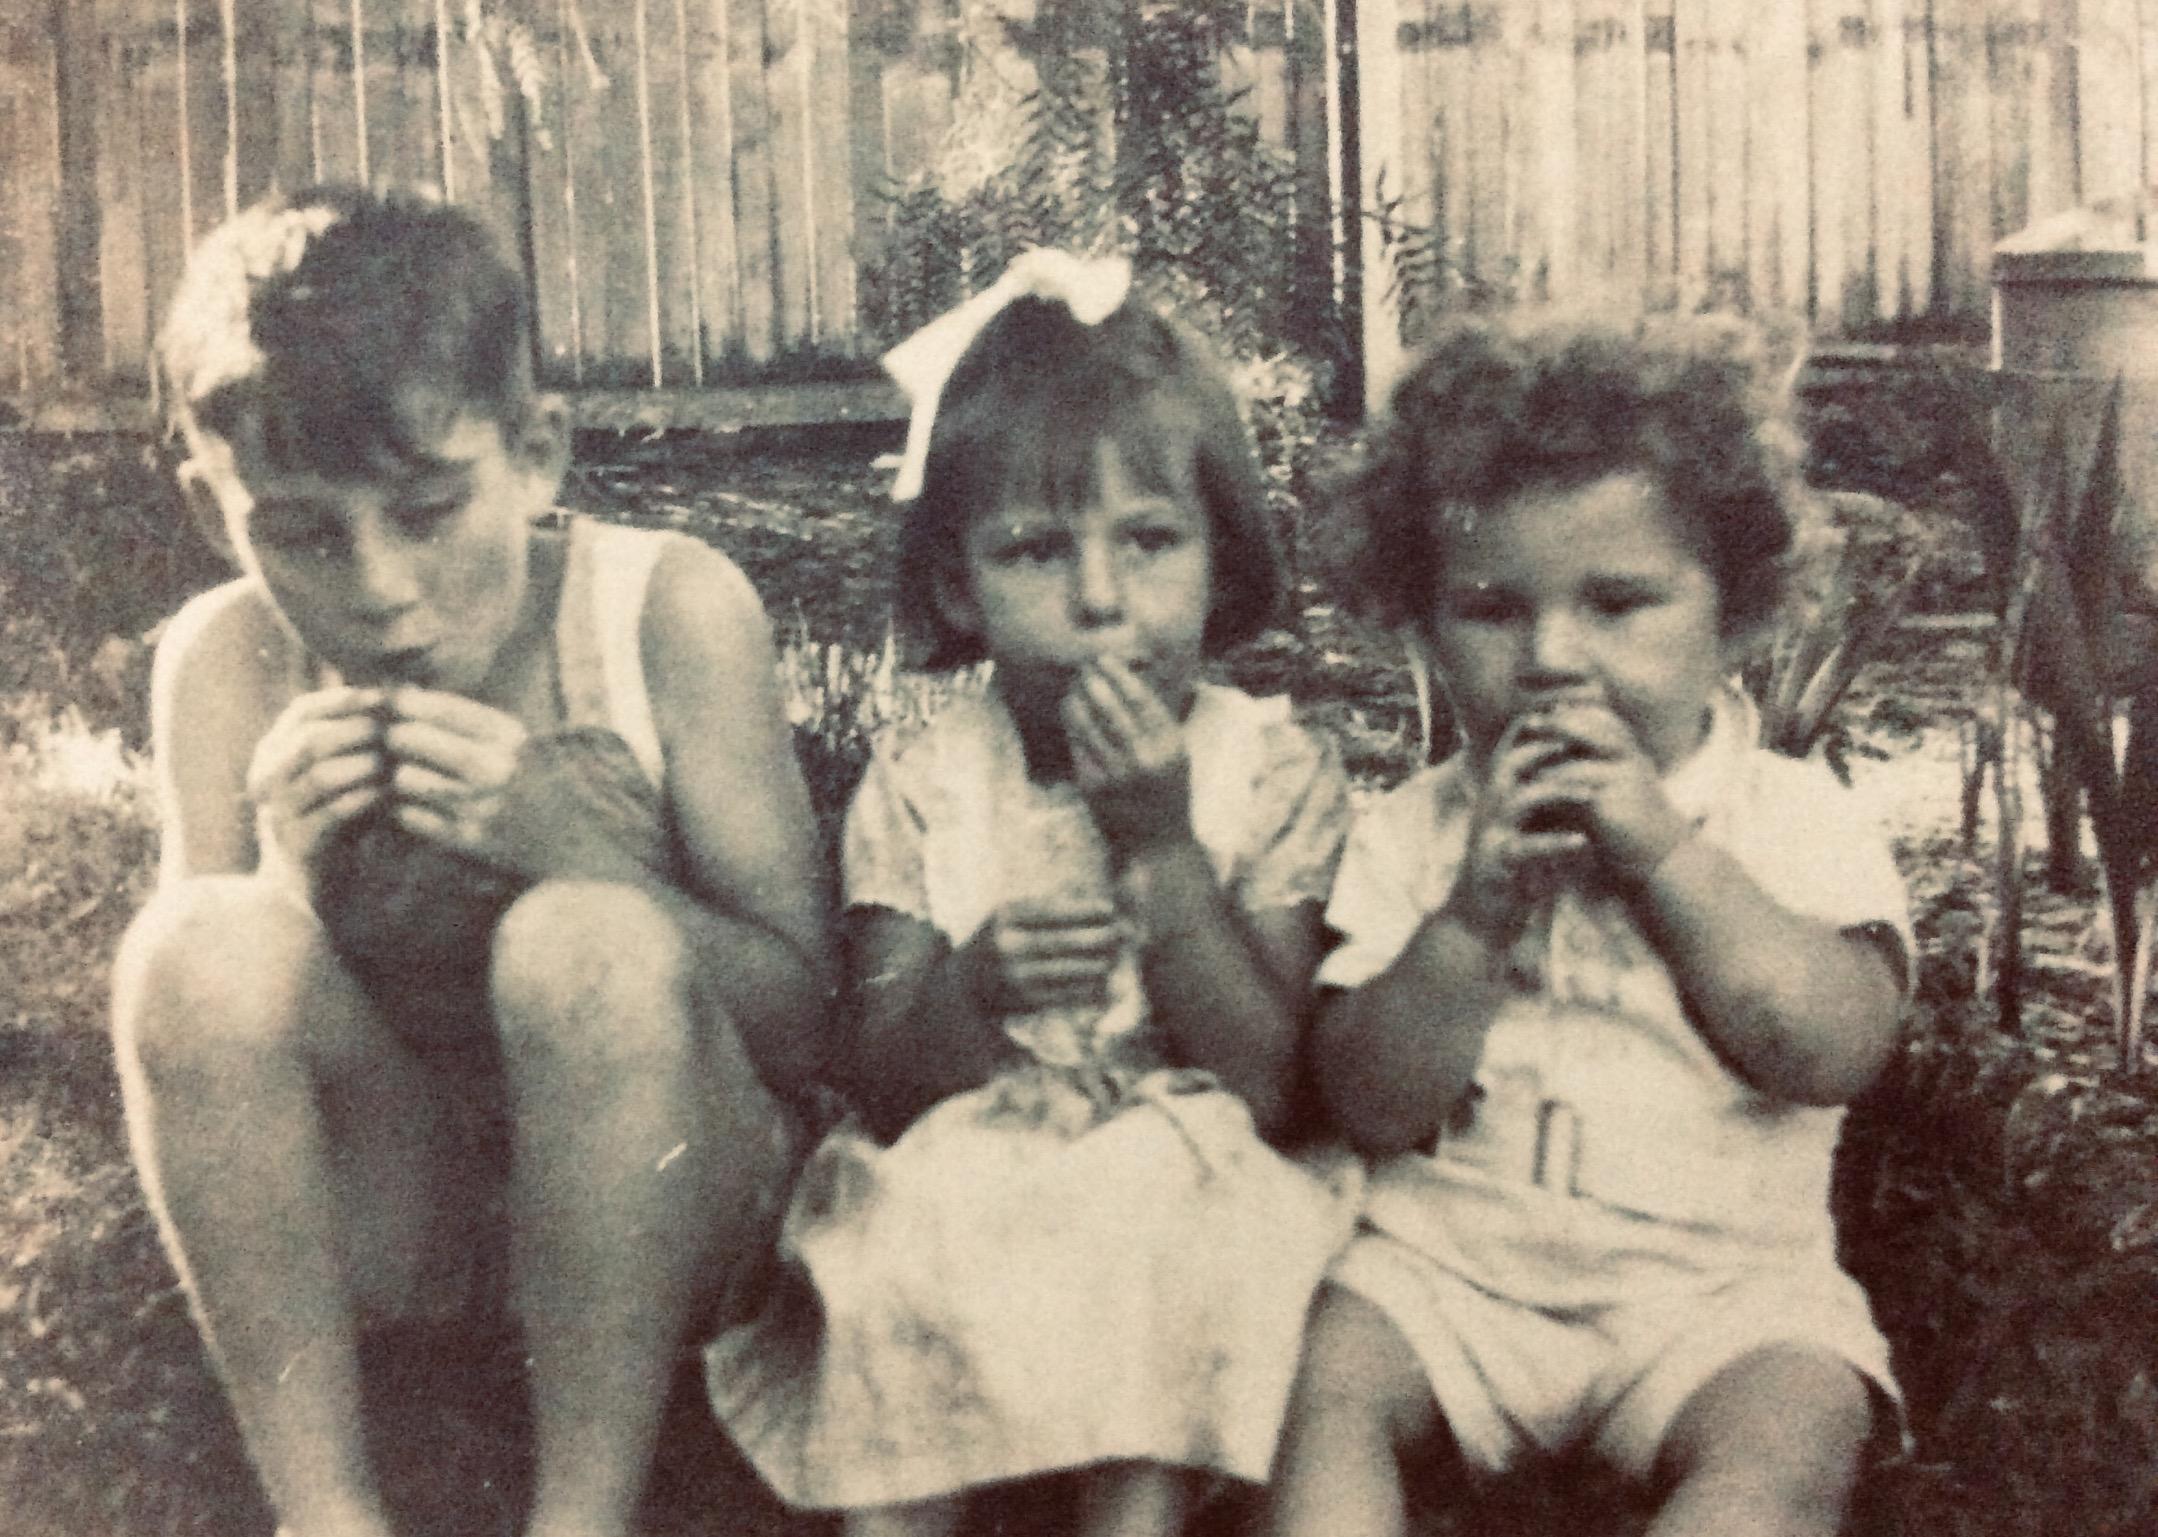 88. Children at 81 Broome St, 1951